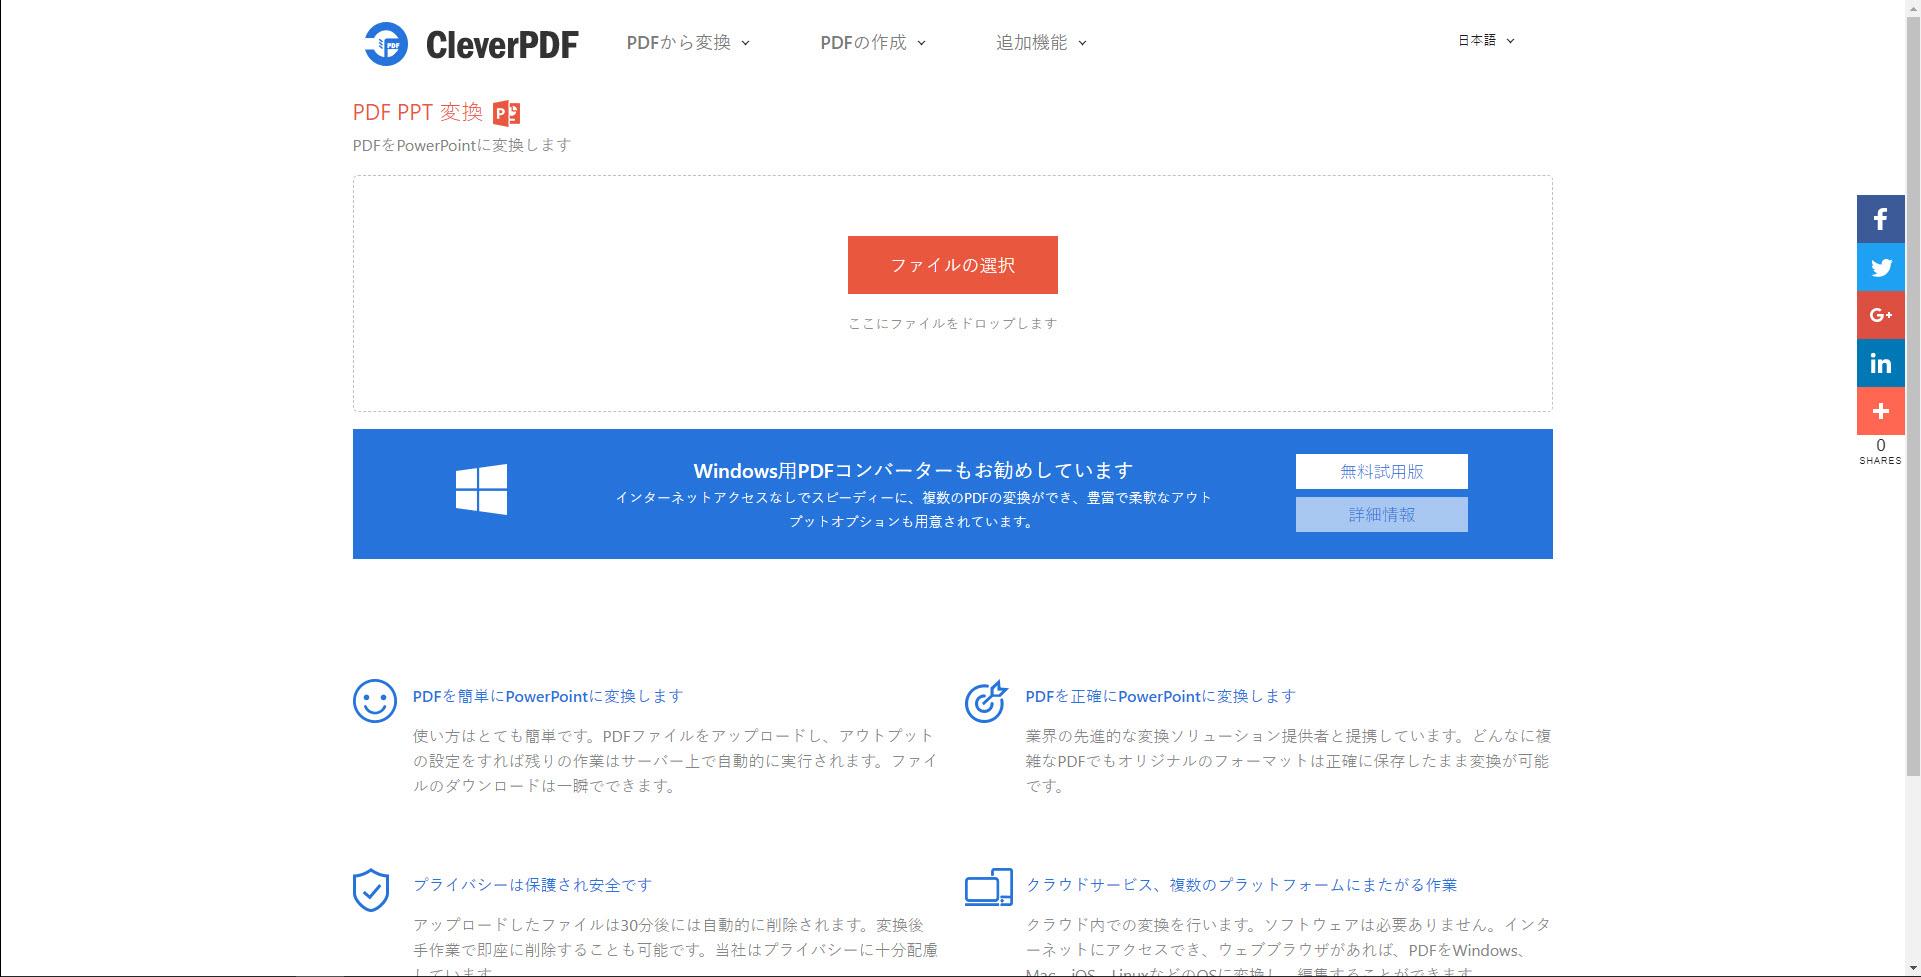 ppt pdf 変換 画像 消える